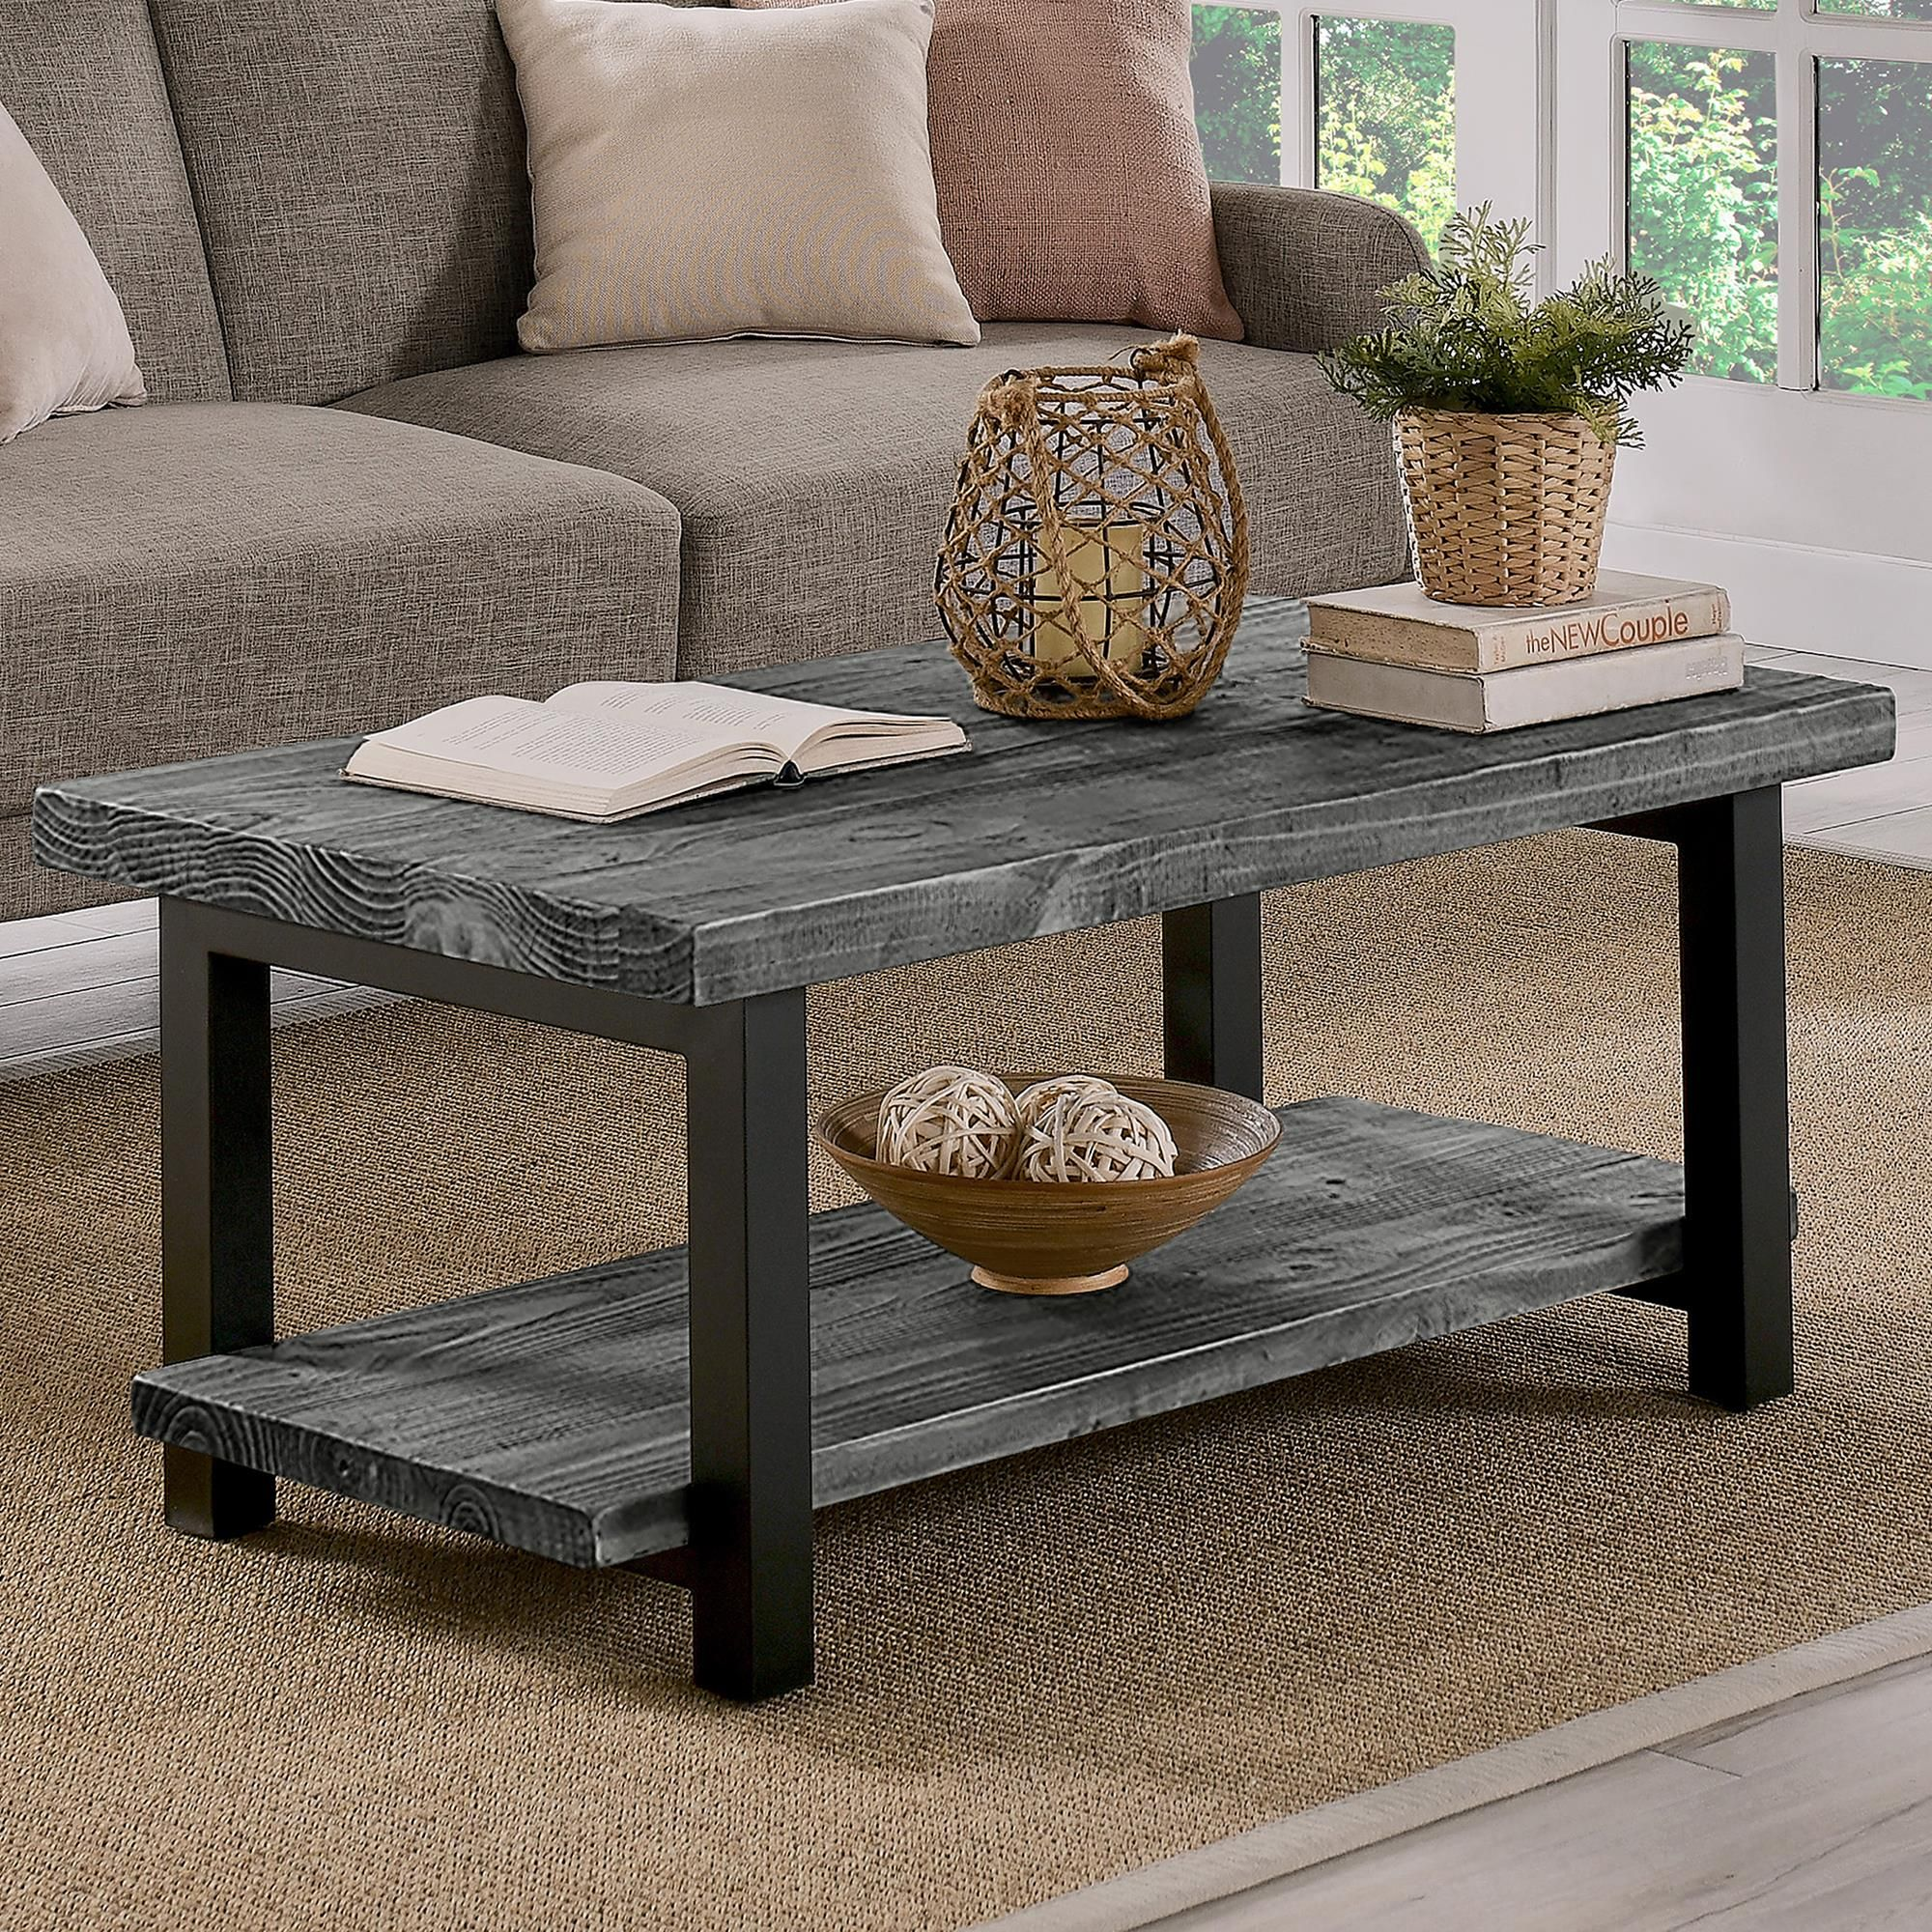 Bolton Furniture Pomona 42 Coffee Table In Black Metal Nfm Coffee Table Alaterre Furniture Coffee Table Wood [ 2000 x 2000 Pixel ]